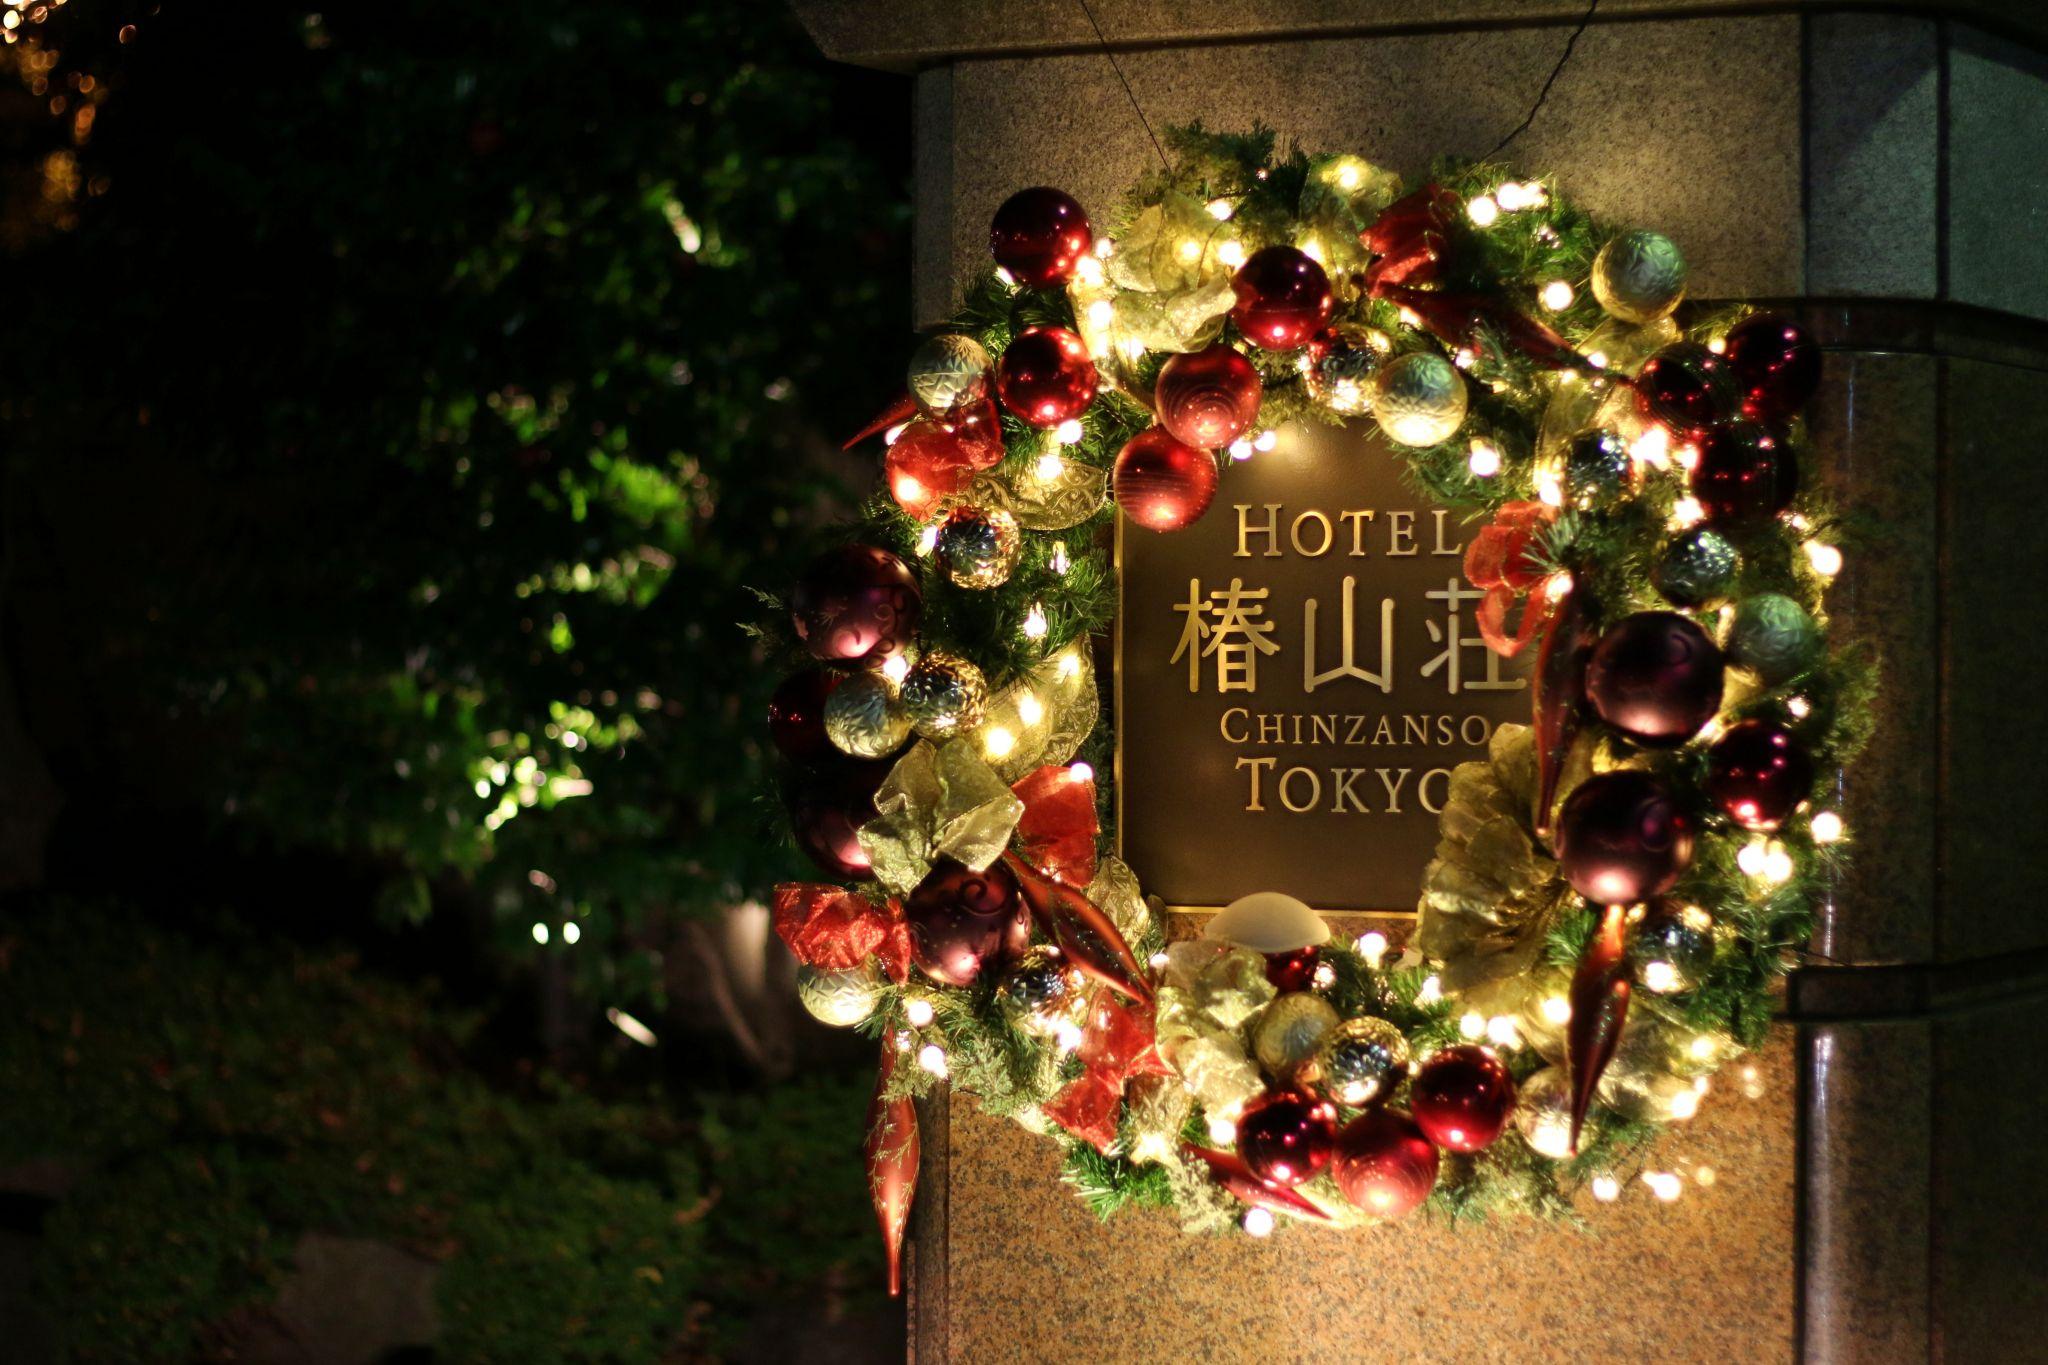 Hotel Chinzanso Tokyo, Japan